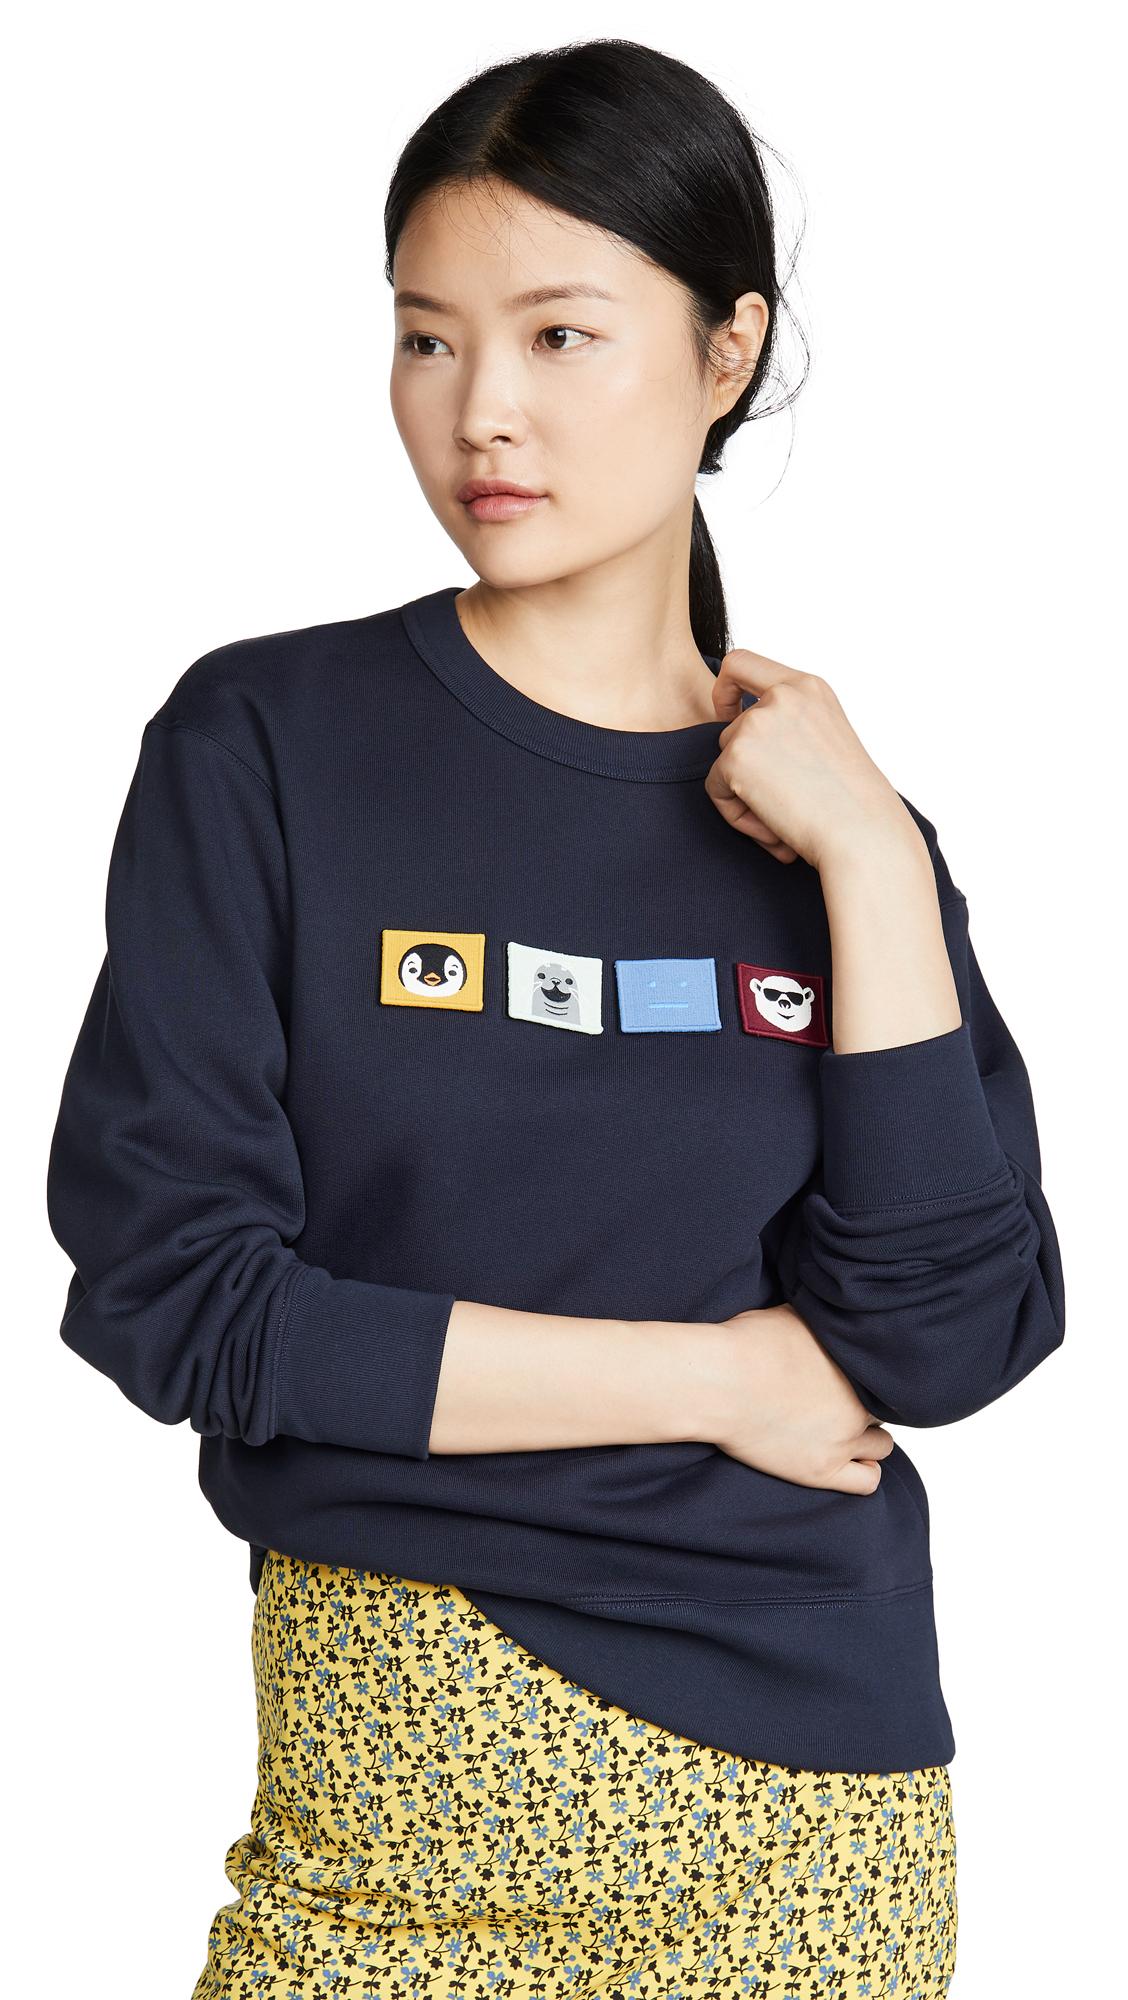 Acne Studios Faircro Animal Face Sweatshirts - Navy Blue